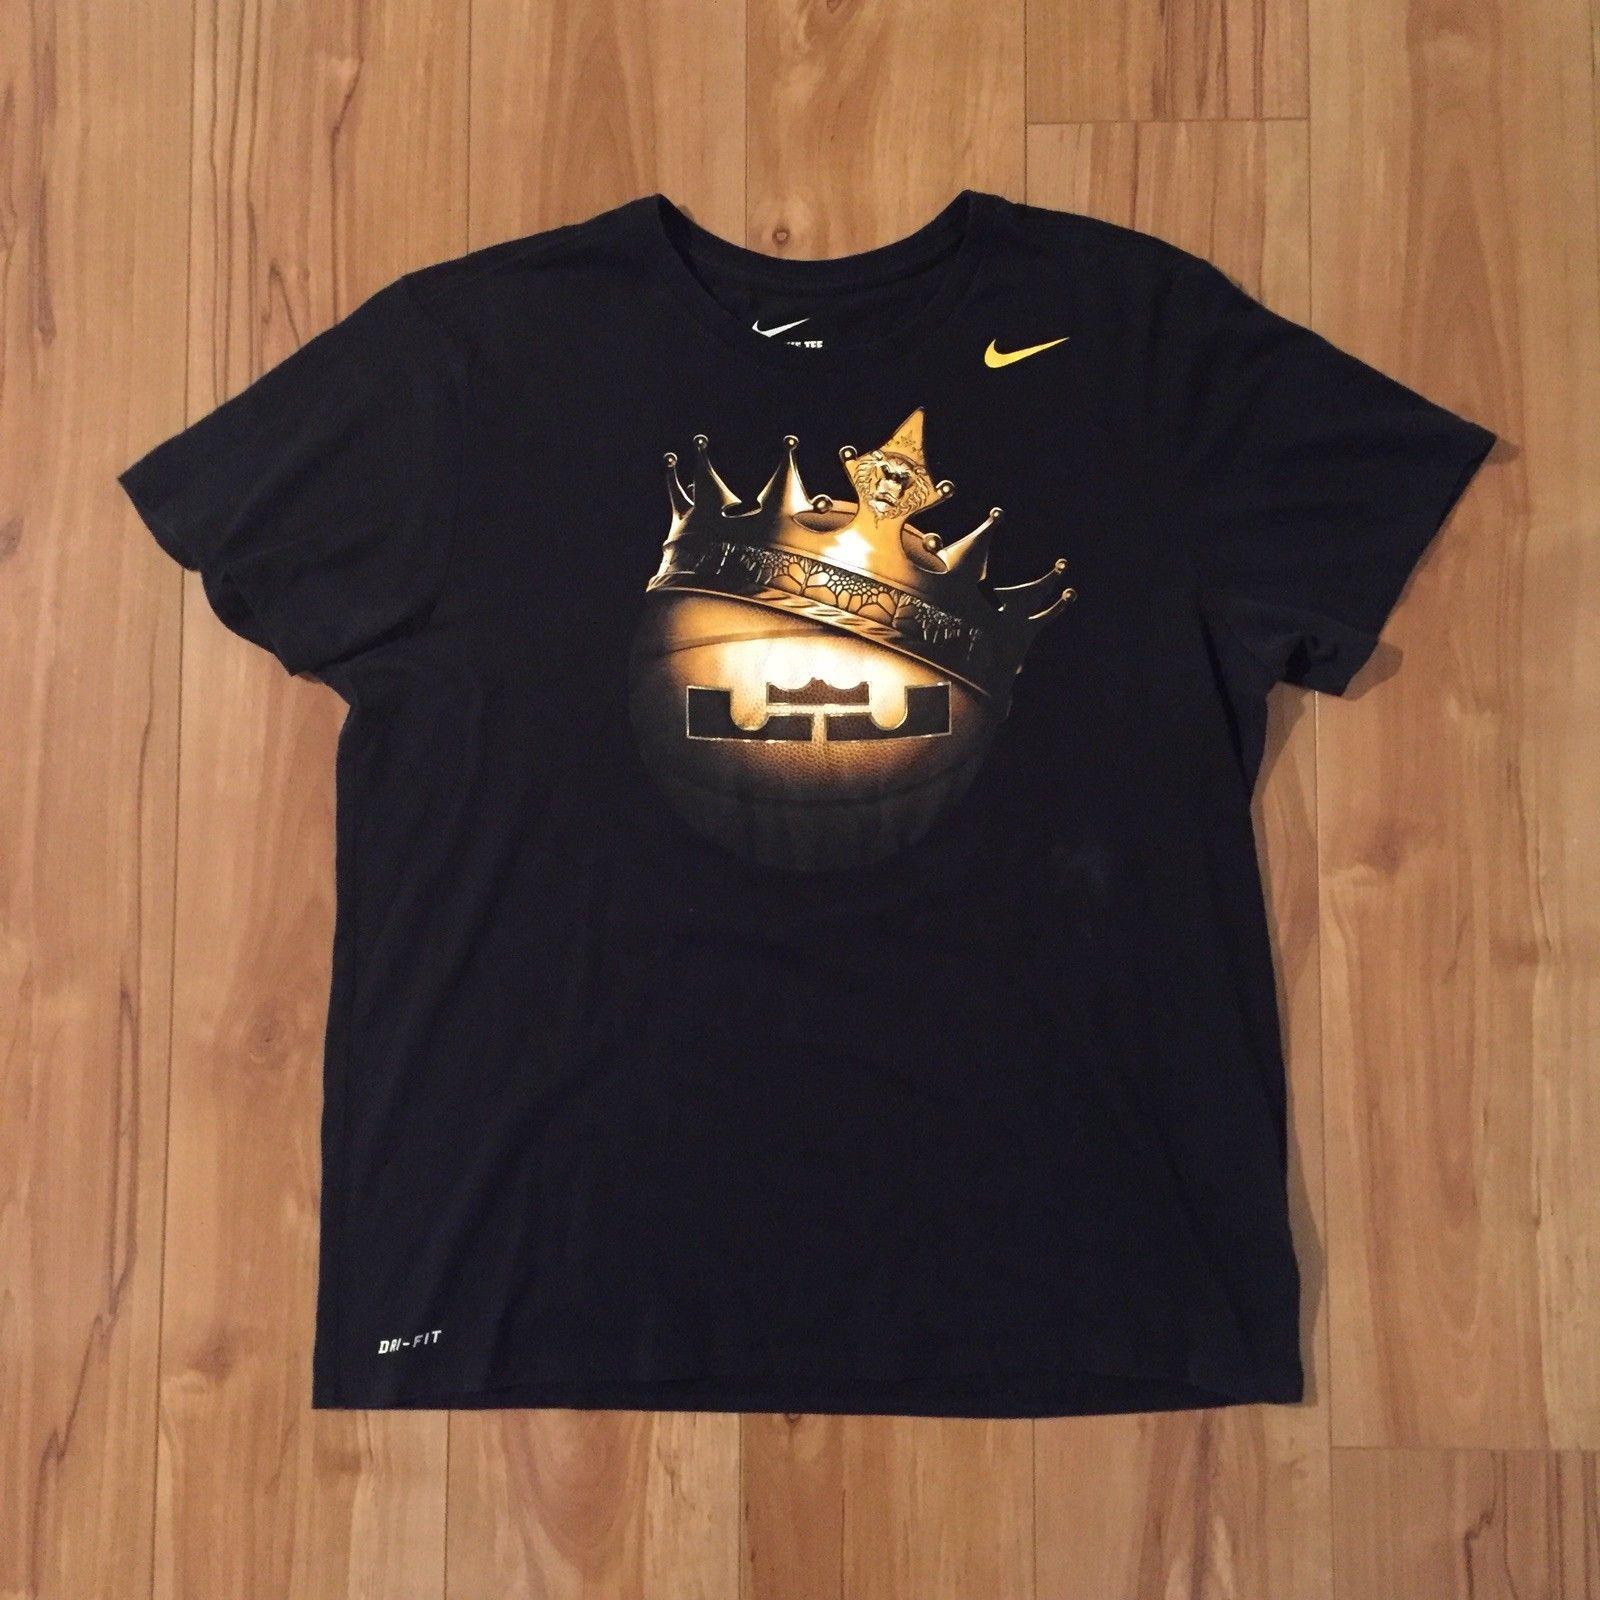 eb168f88e5cf Lebron James King Nike Crown Basketball Dri-Fit T-Shirt Black Youth Boys  2XL XXL | eBay